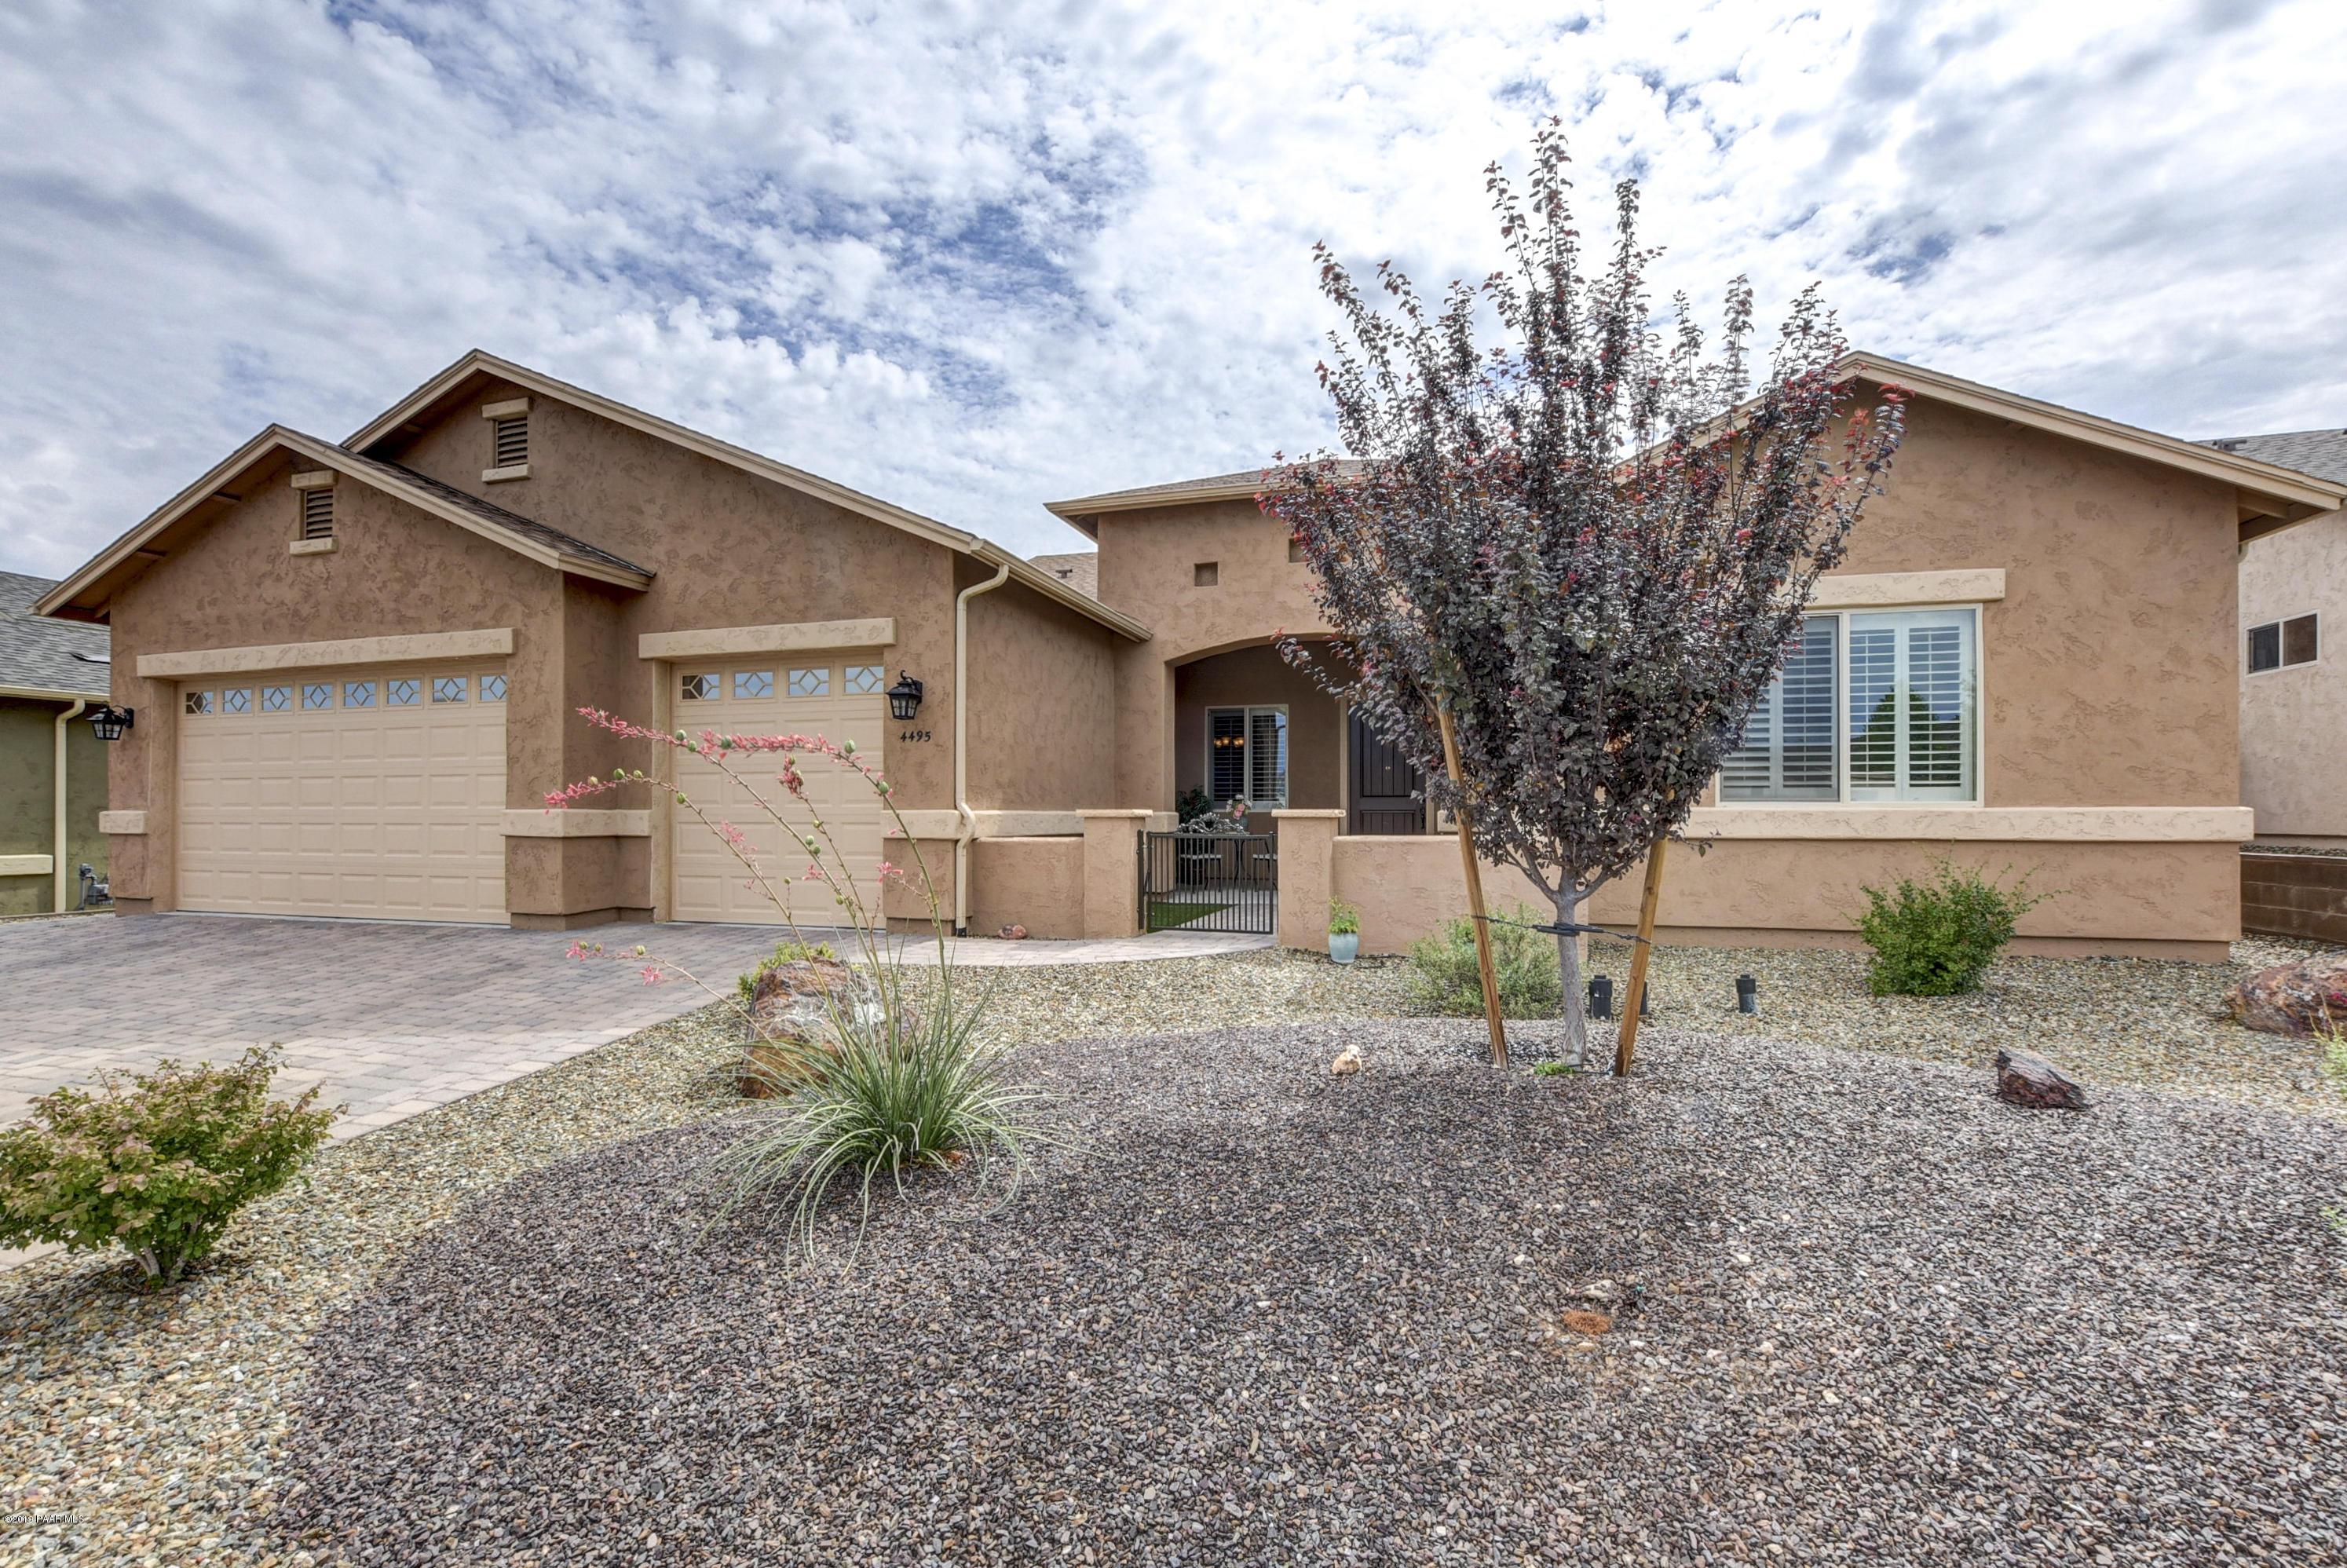 Photo of 4495 Cambridge, Prescott Valley, AZ 86314